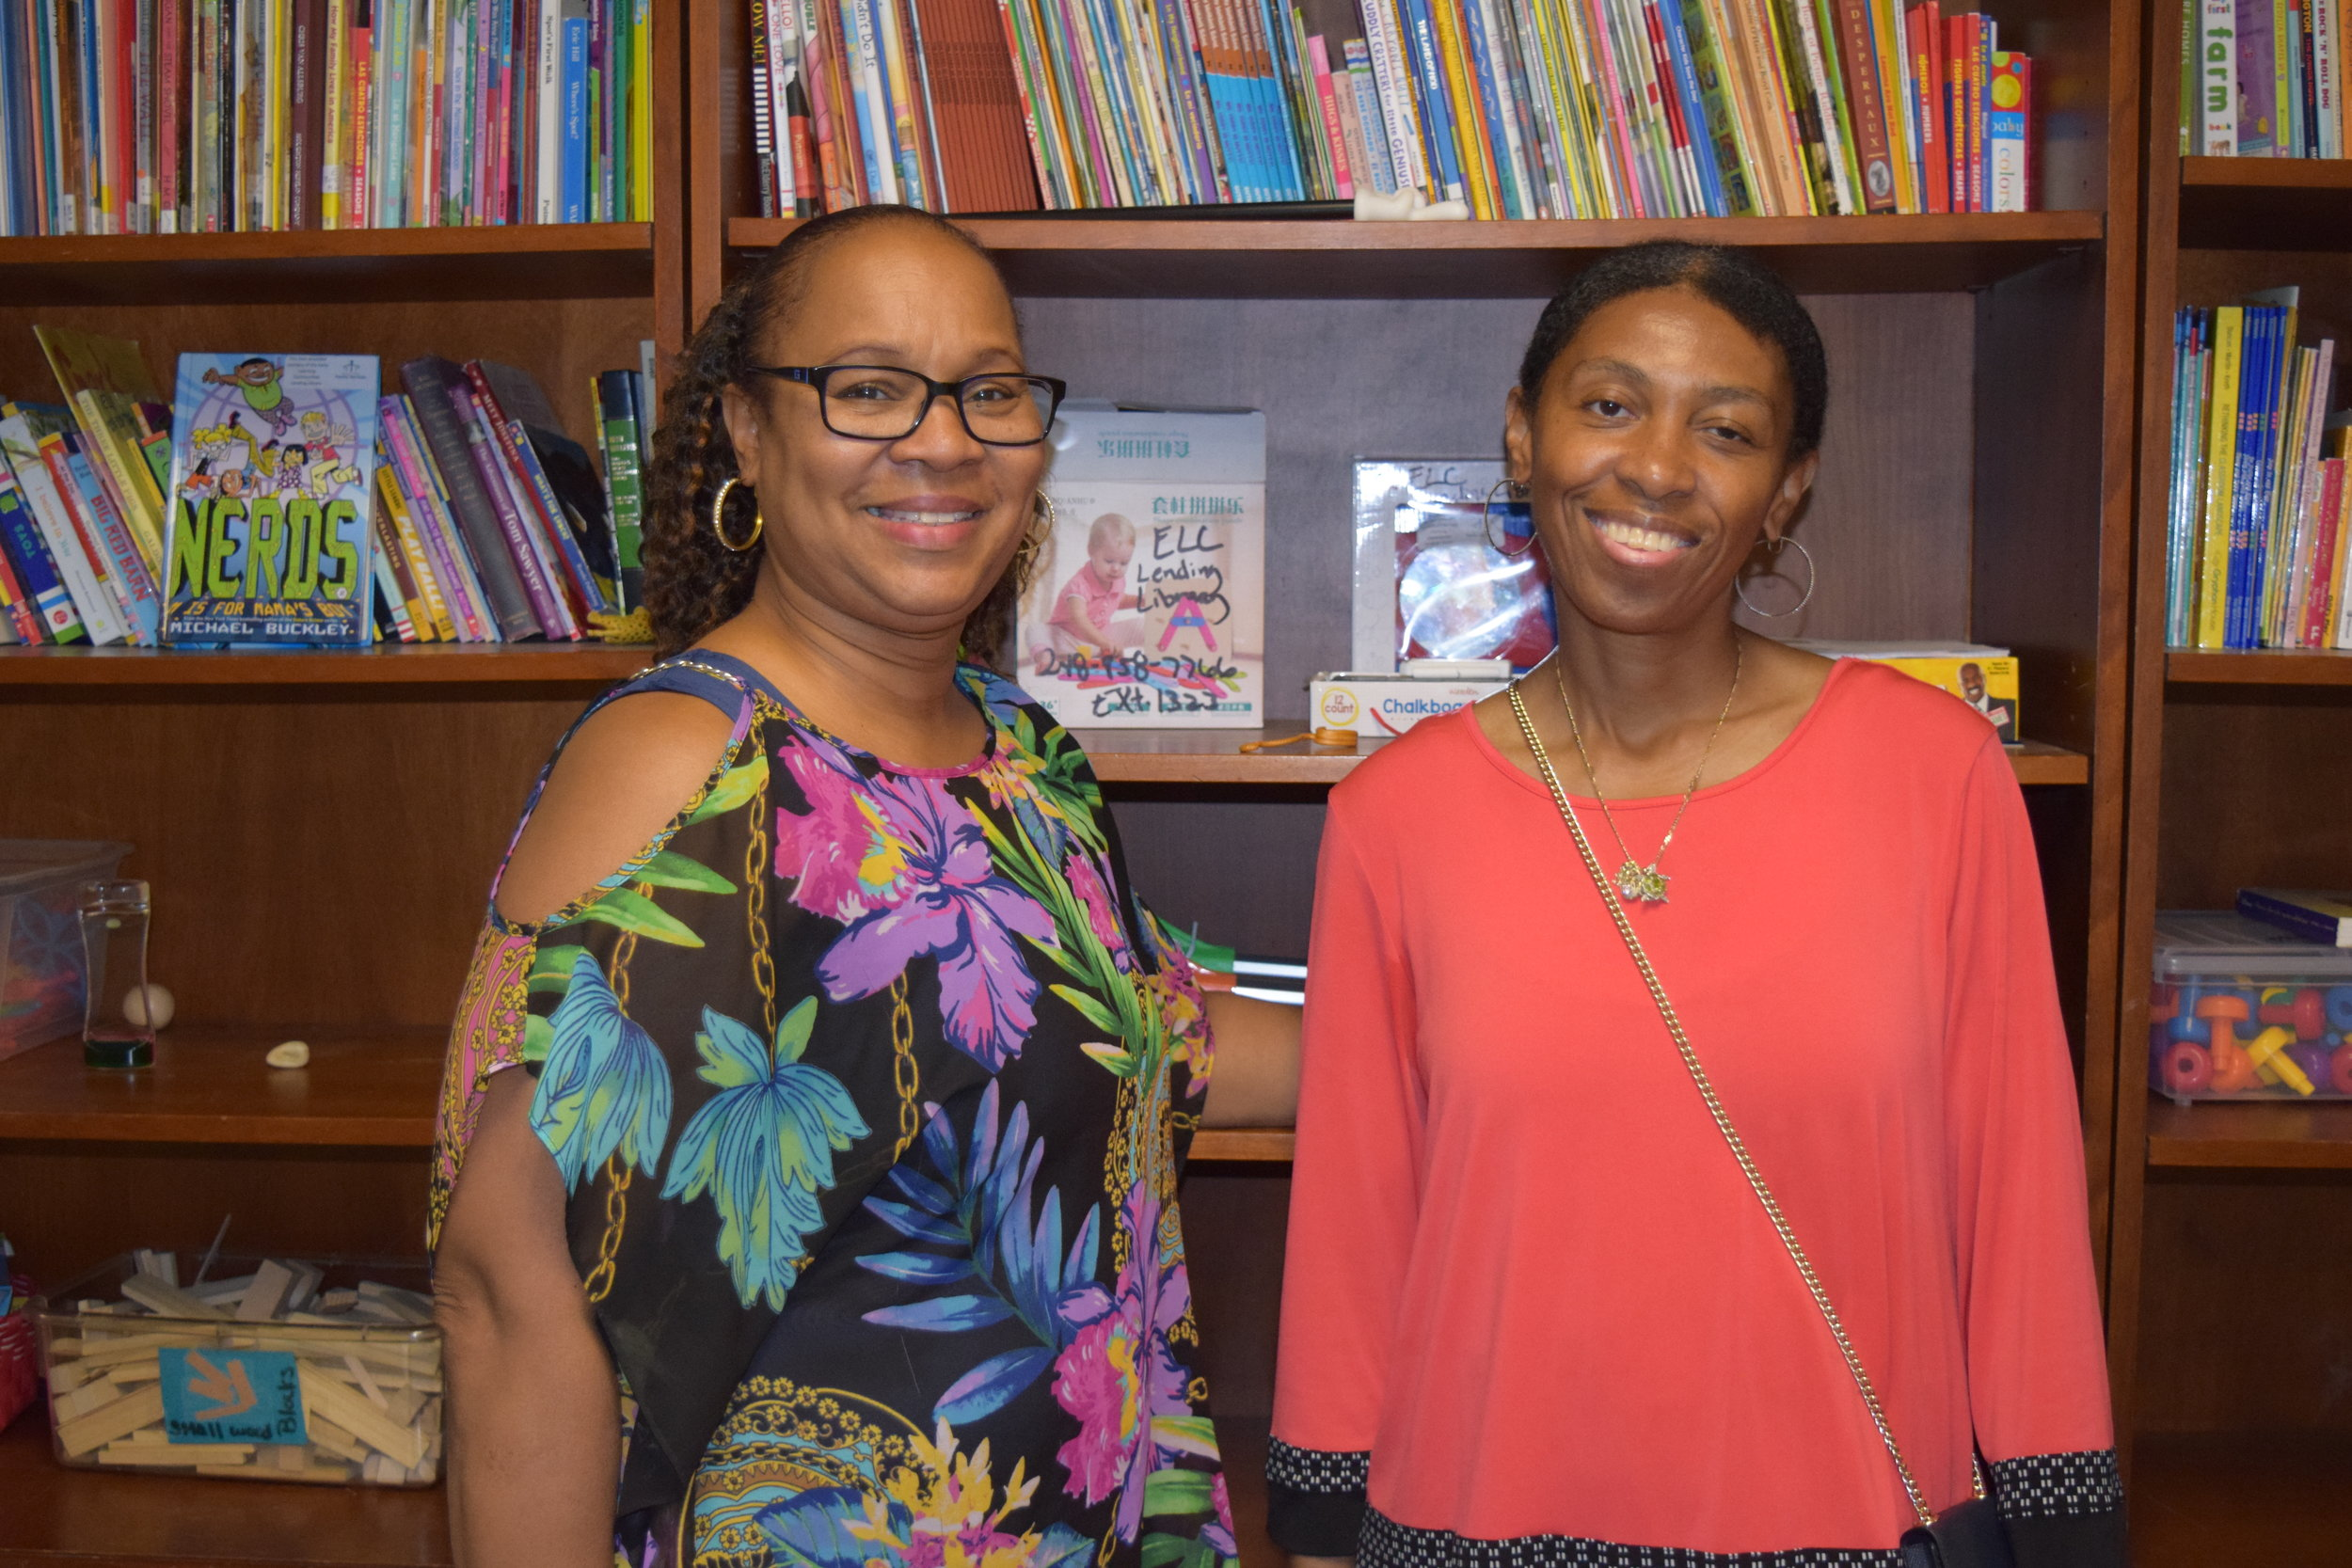 Children's Learning Center Lead Teacher Carolyn Moody (left) with Monica.